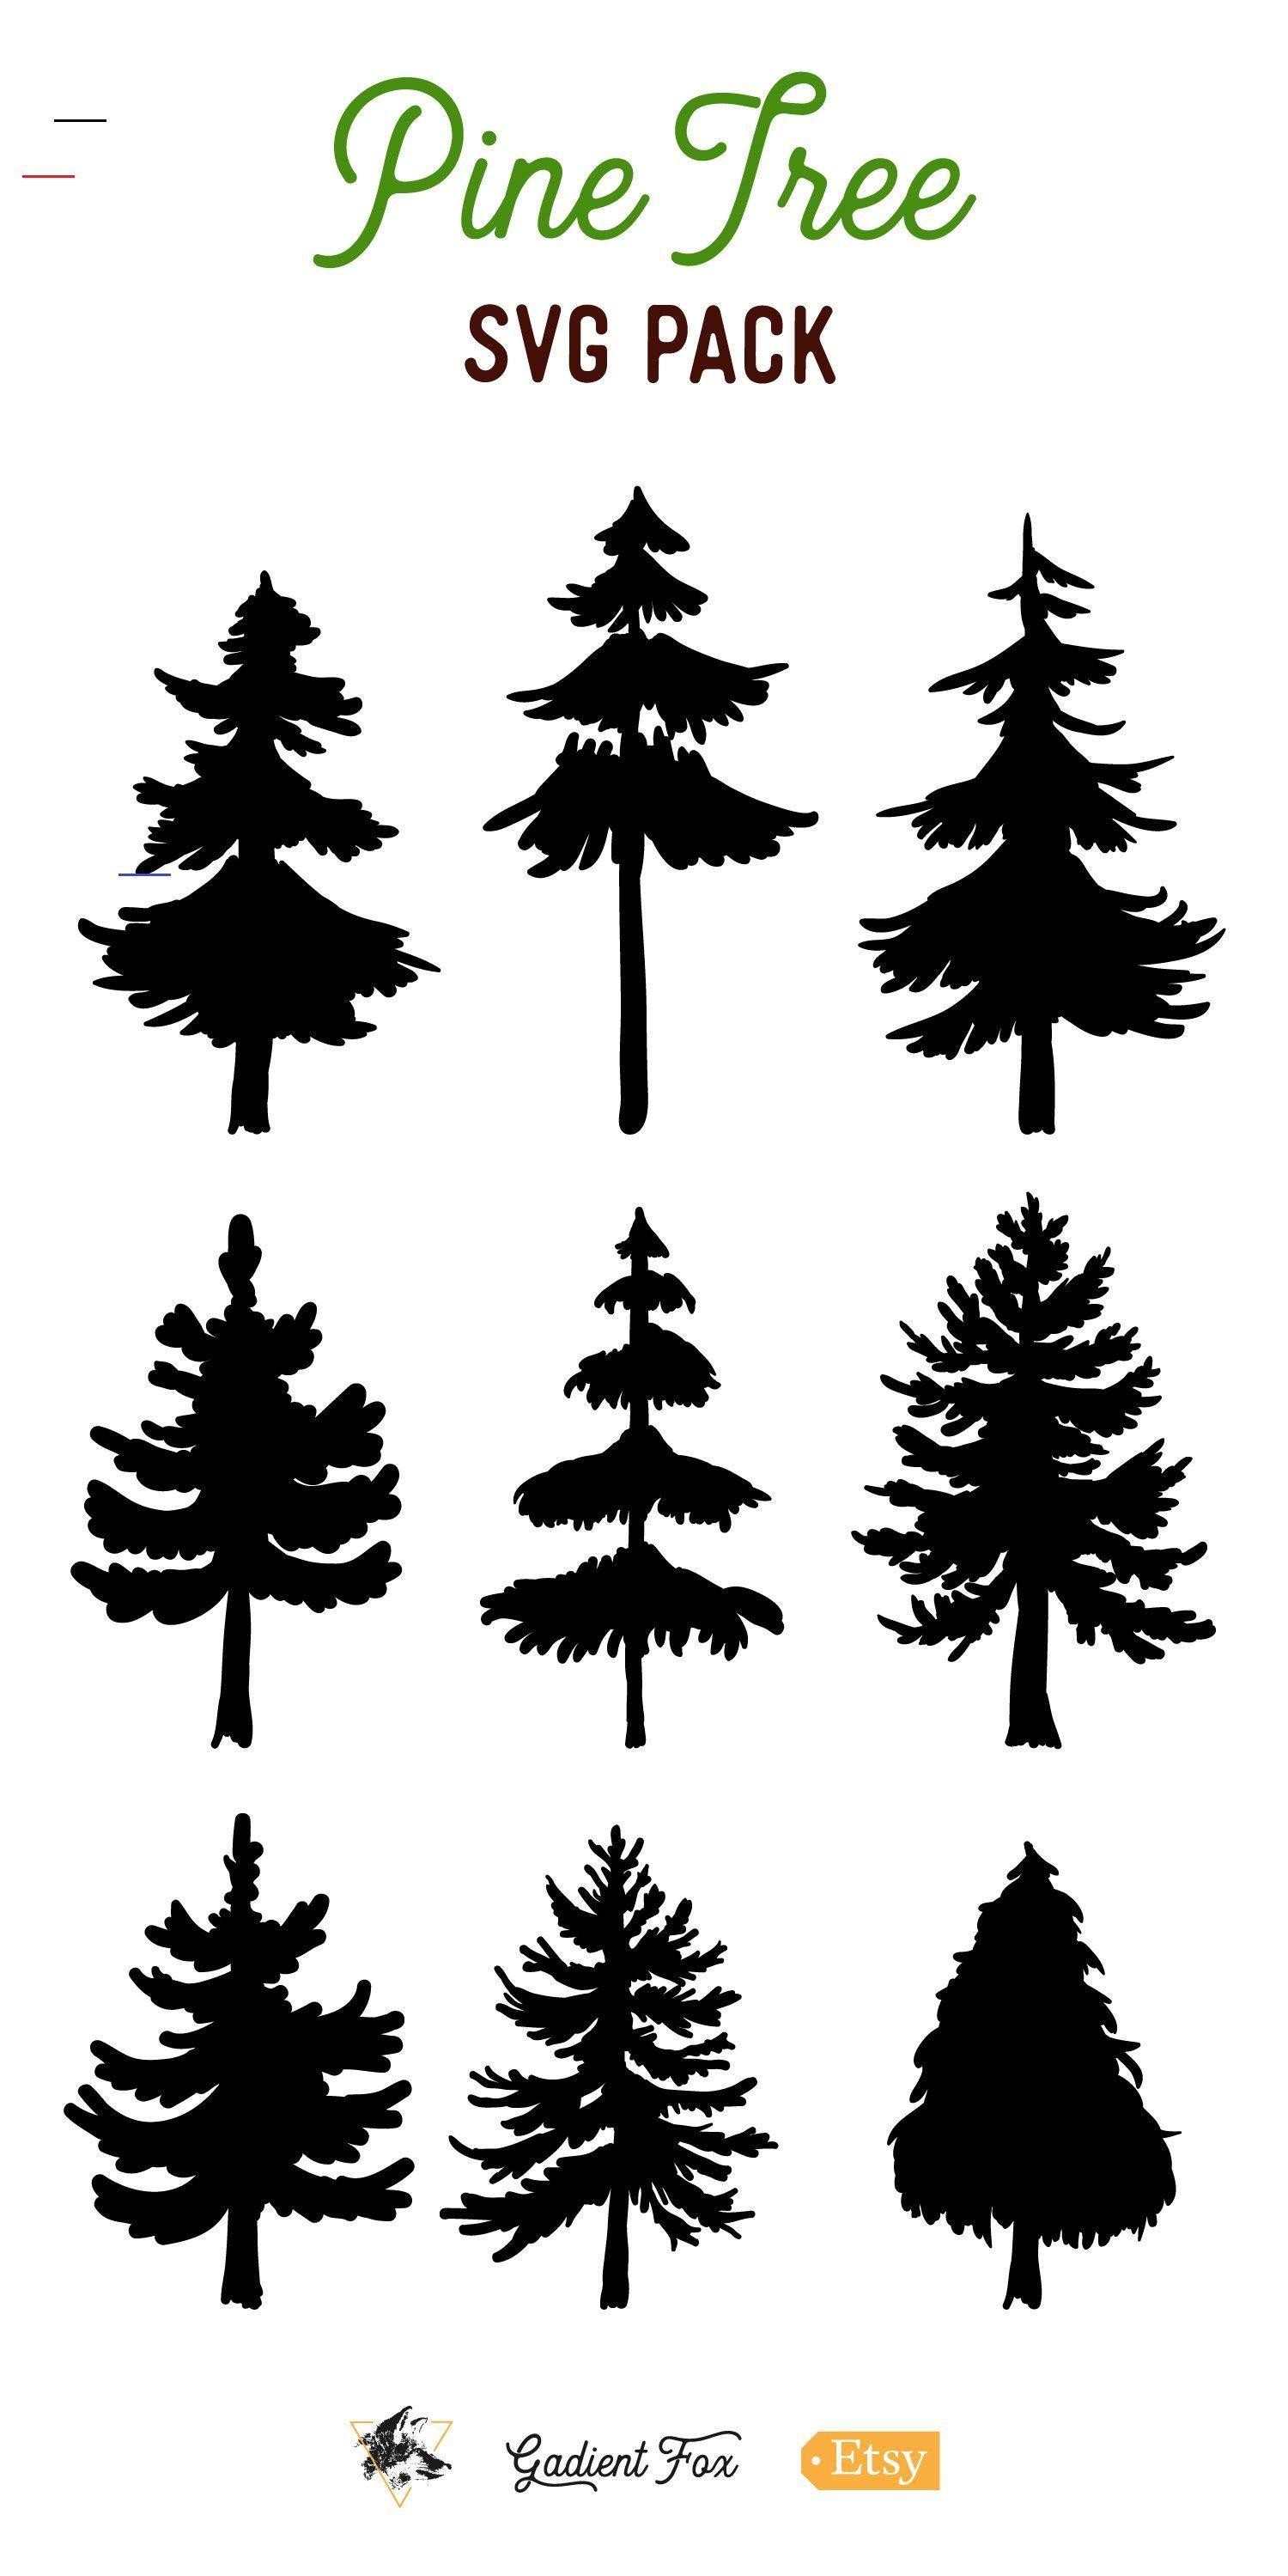 9 Vector Pine Tree Silhouette Illustrations (155339